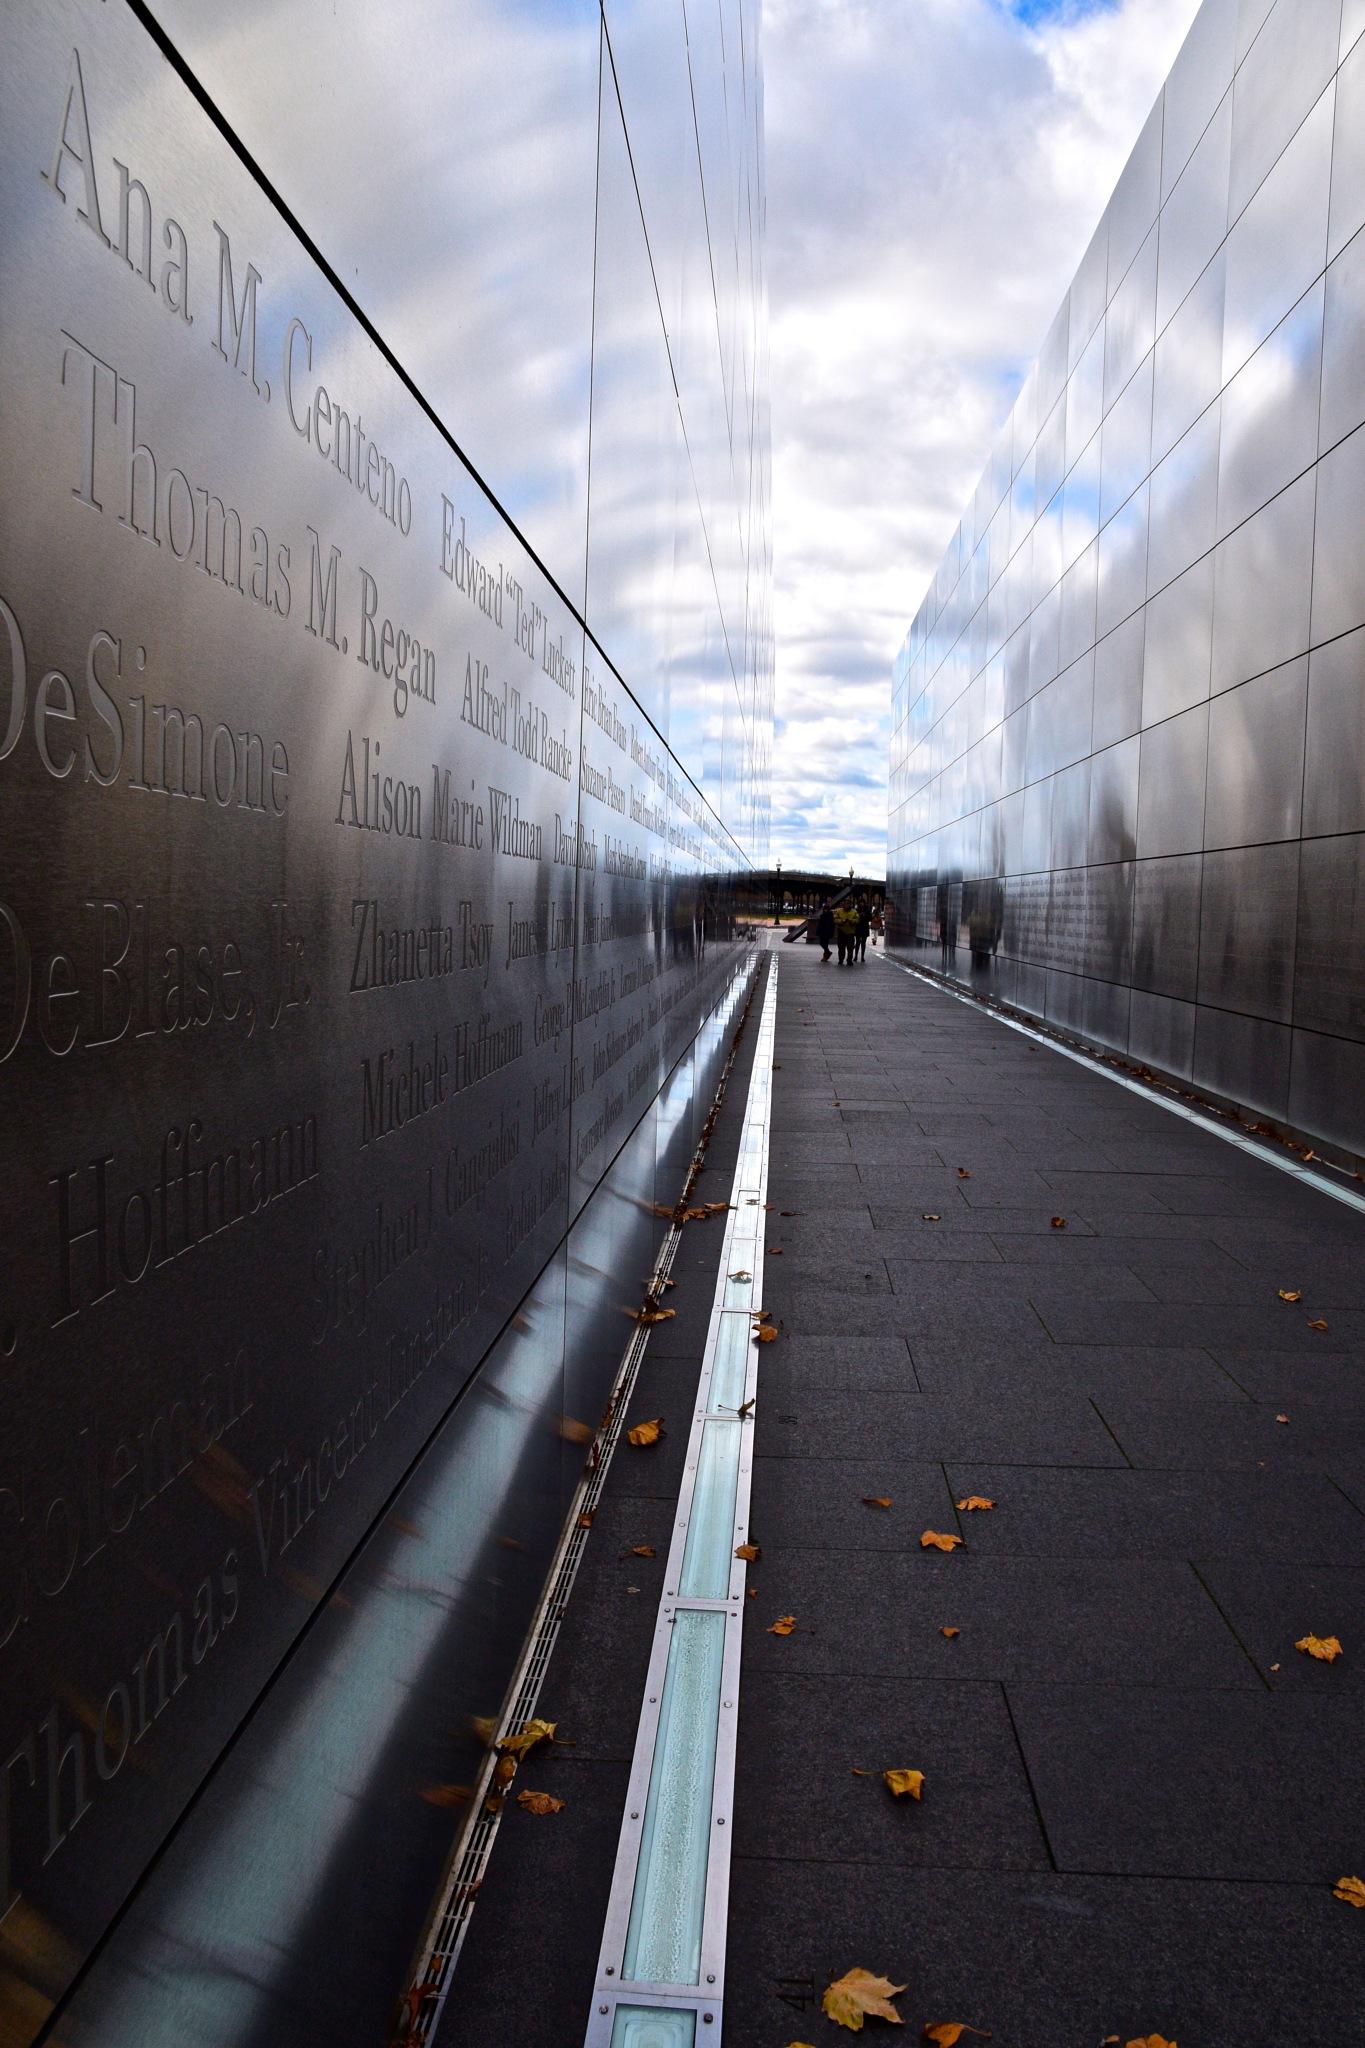 9/11 Memorial by Ivana Castelo-Branco